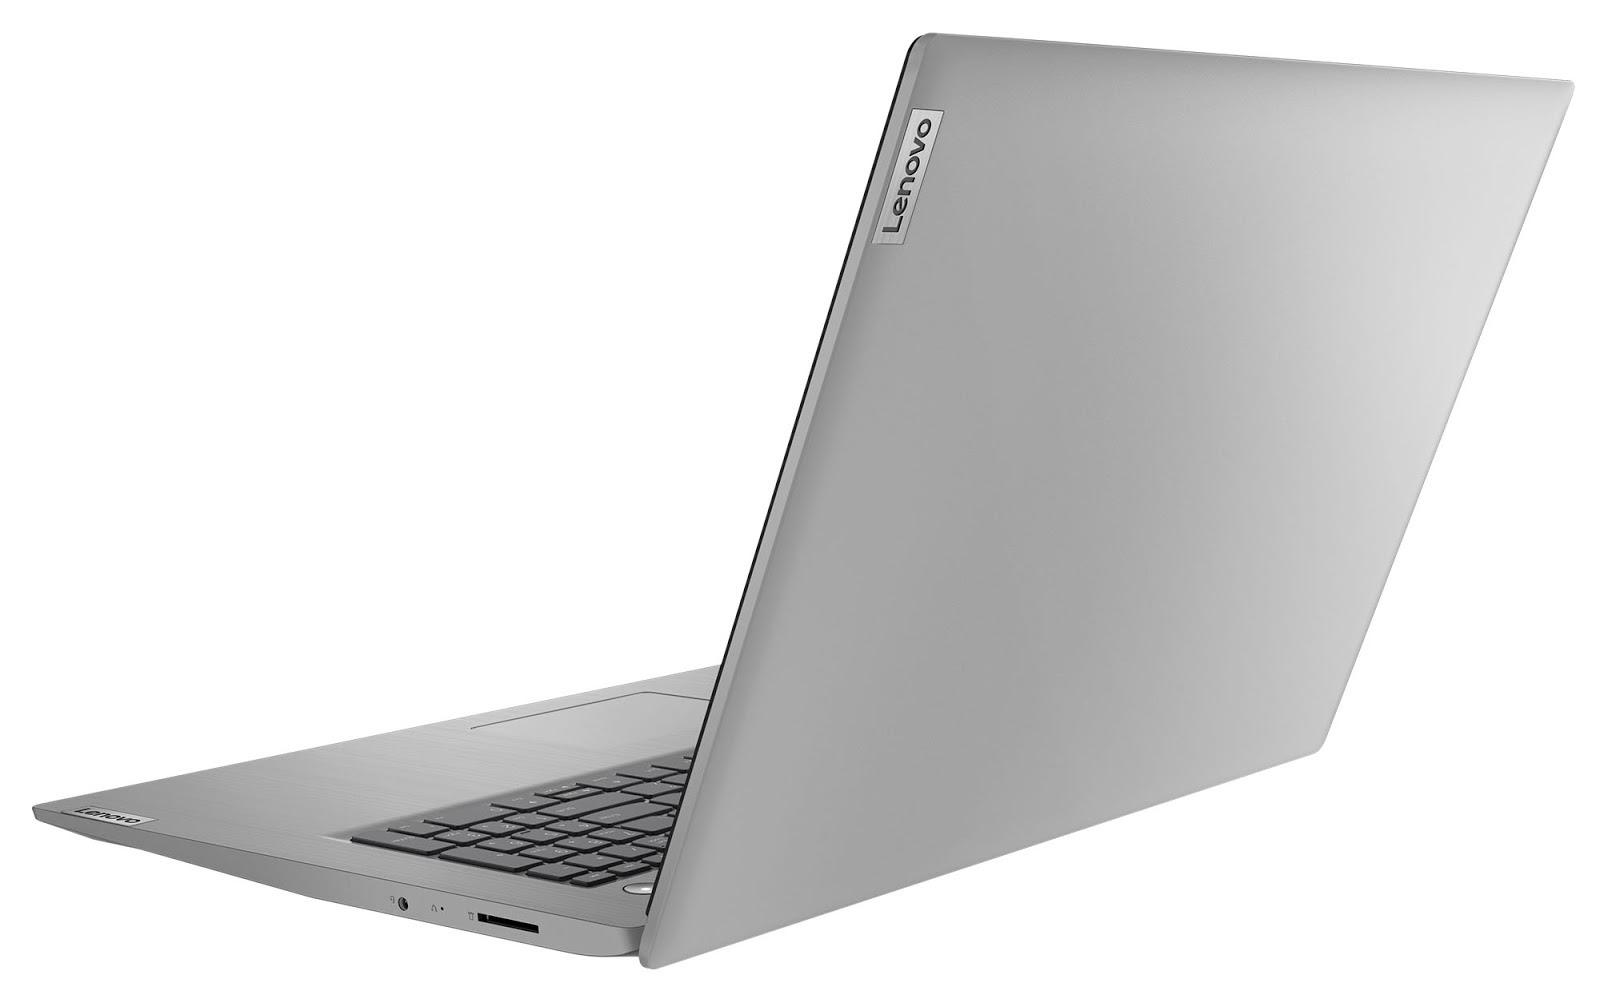 Фото 1. Ноутбук Lenovo ideapad 3 17ADA05 Platinum Grey (81W20043RE)